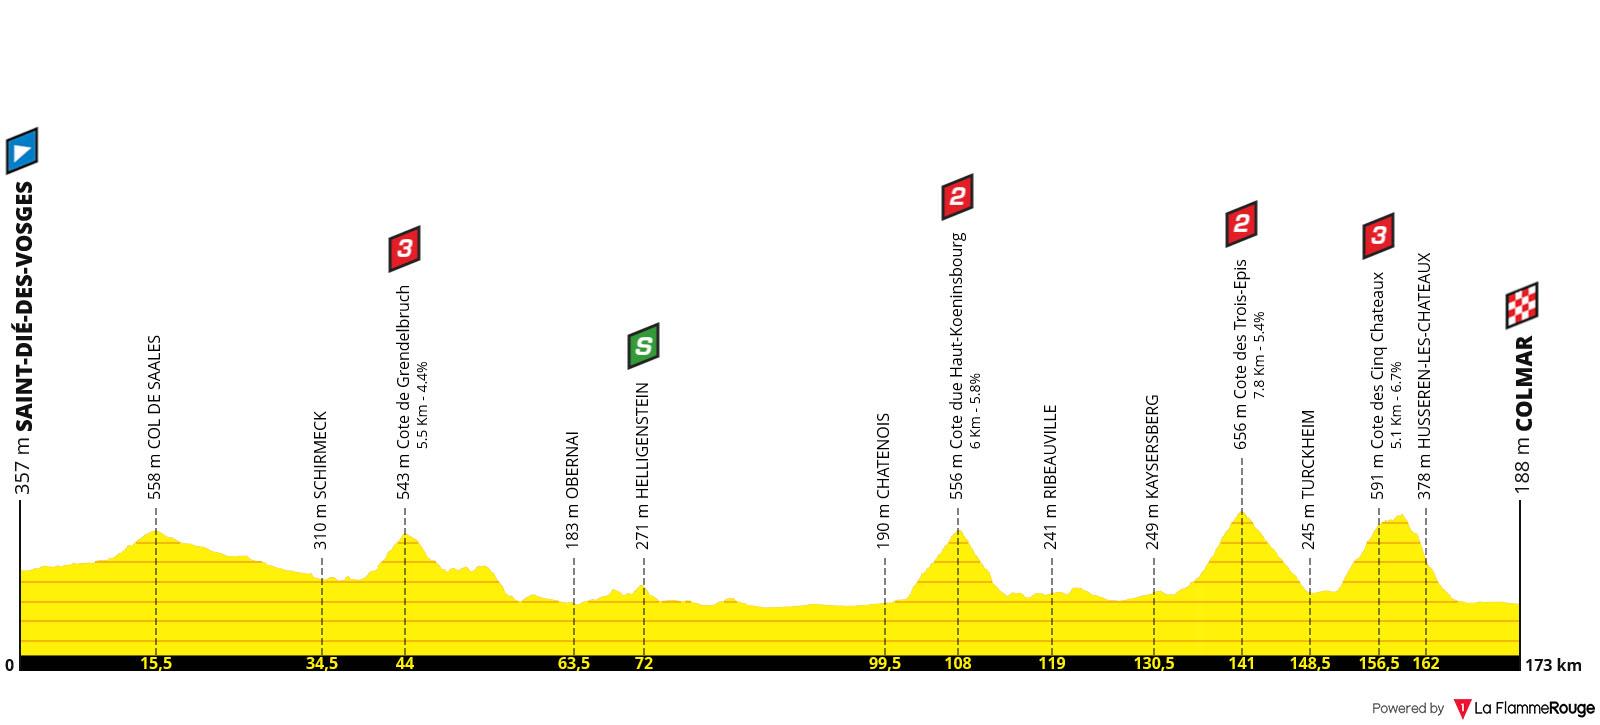 Perfil Etapa 05 - Tour de Francia 2019